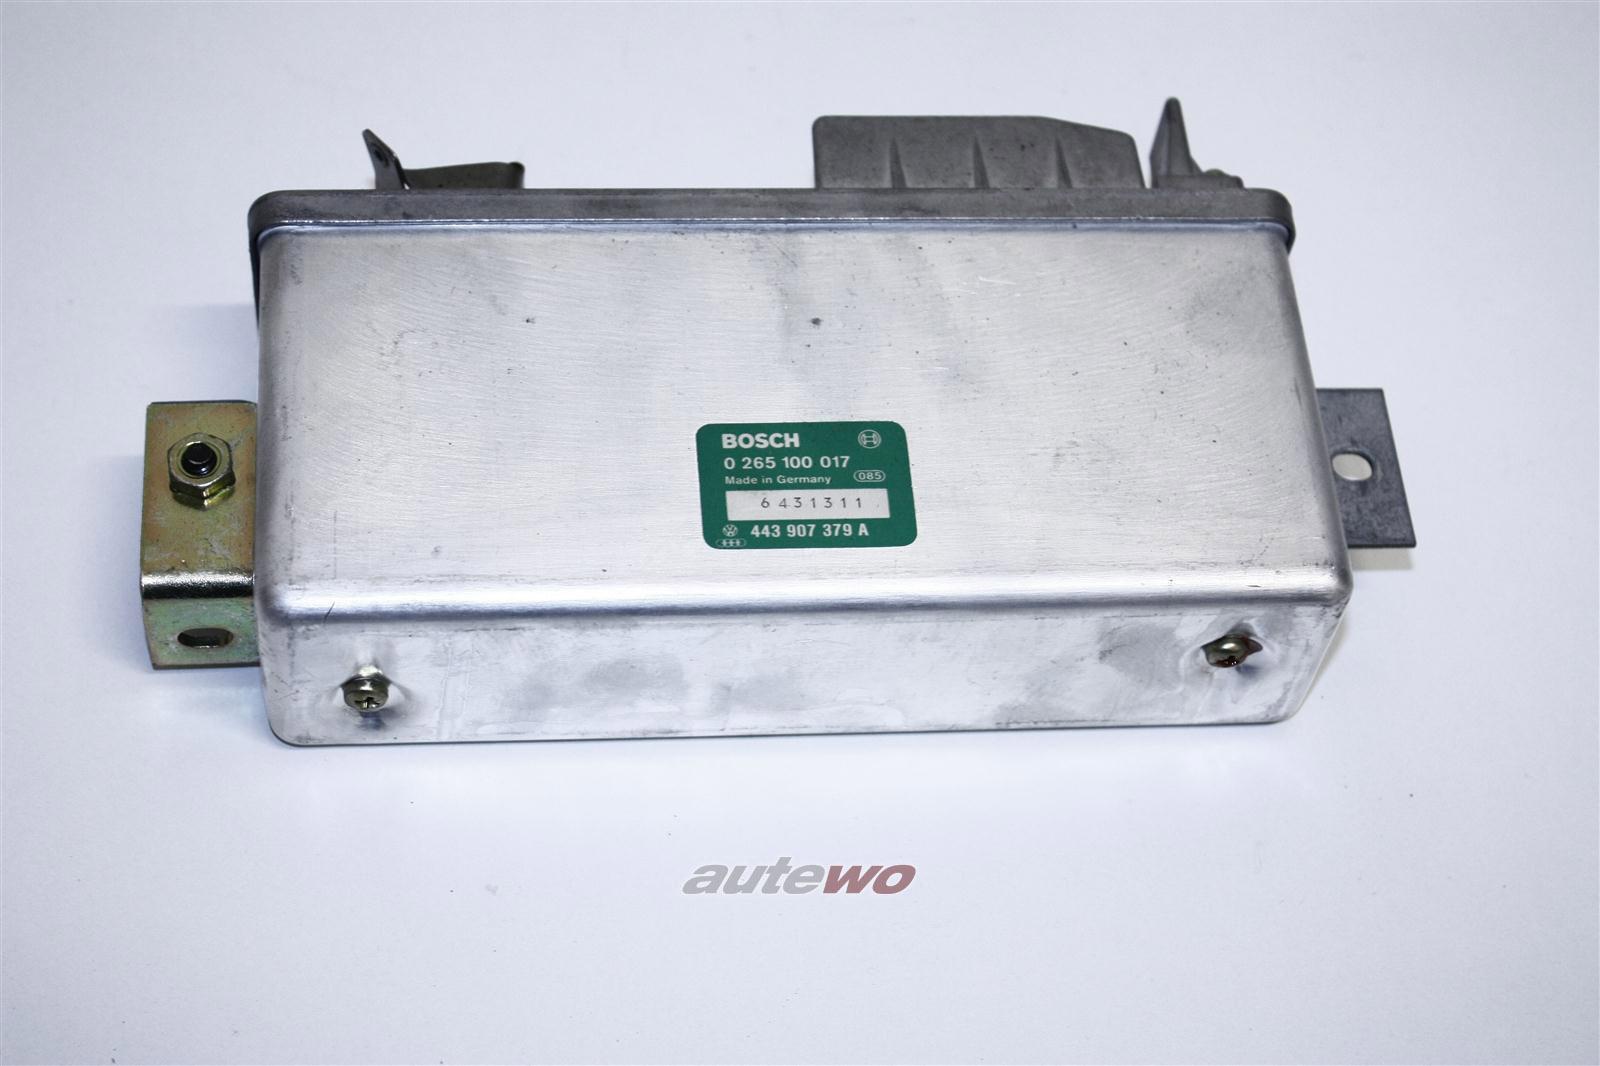 Audi 80/90 Typ 81/100 Typ 44 ABS Steuergerät 443907379B